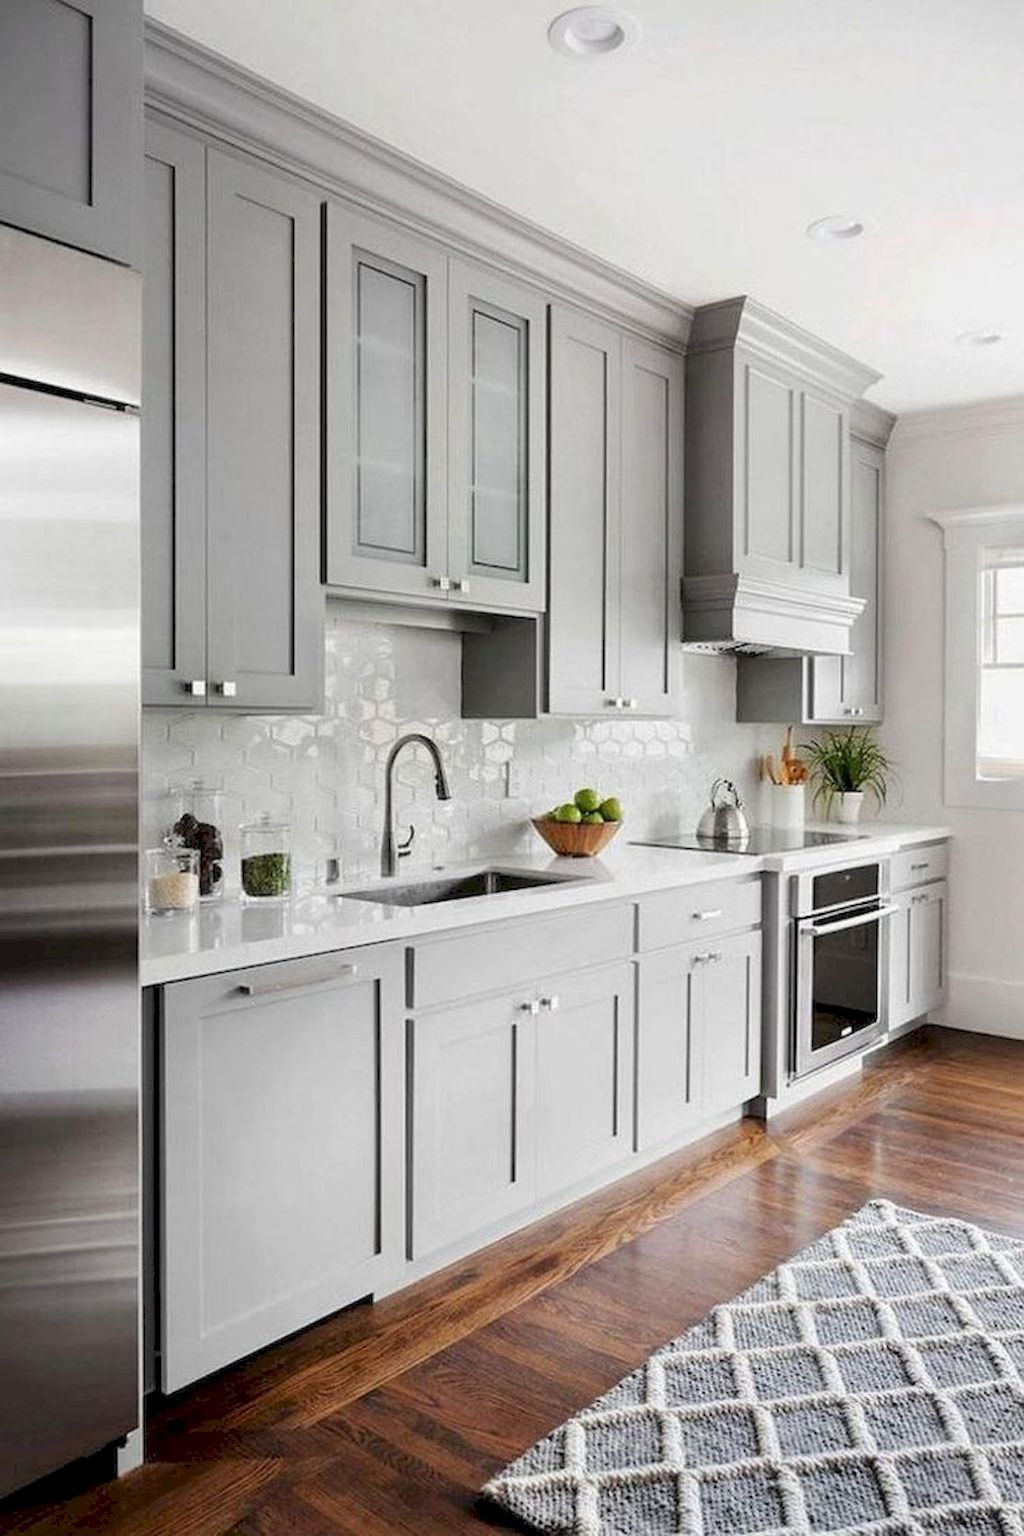 Beautiful Farmhouse Style Kitchen Cabinet Ideas 01 In 2019